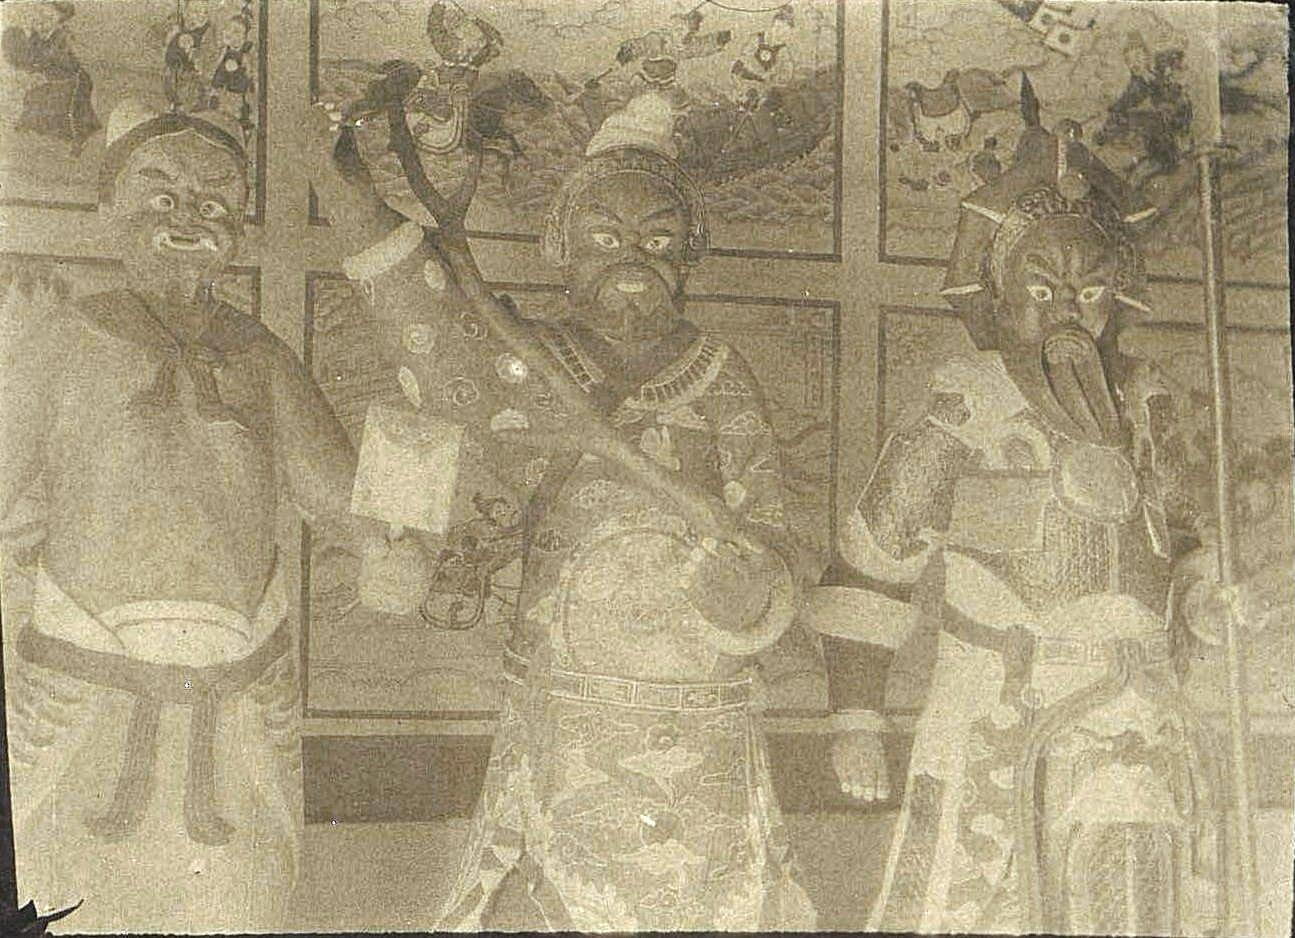 37. «Кумирни города Гирина. Боги». Ноябрь 1900